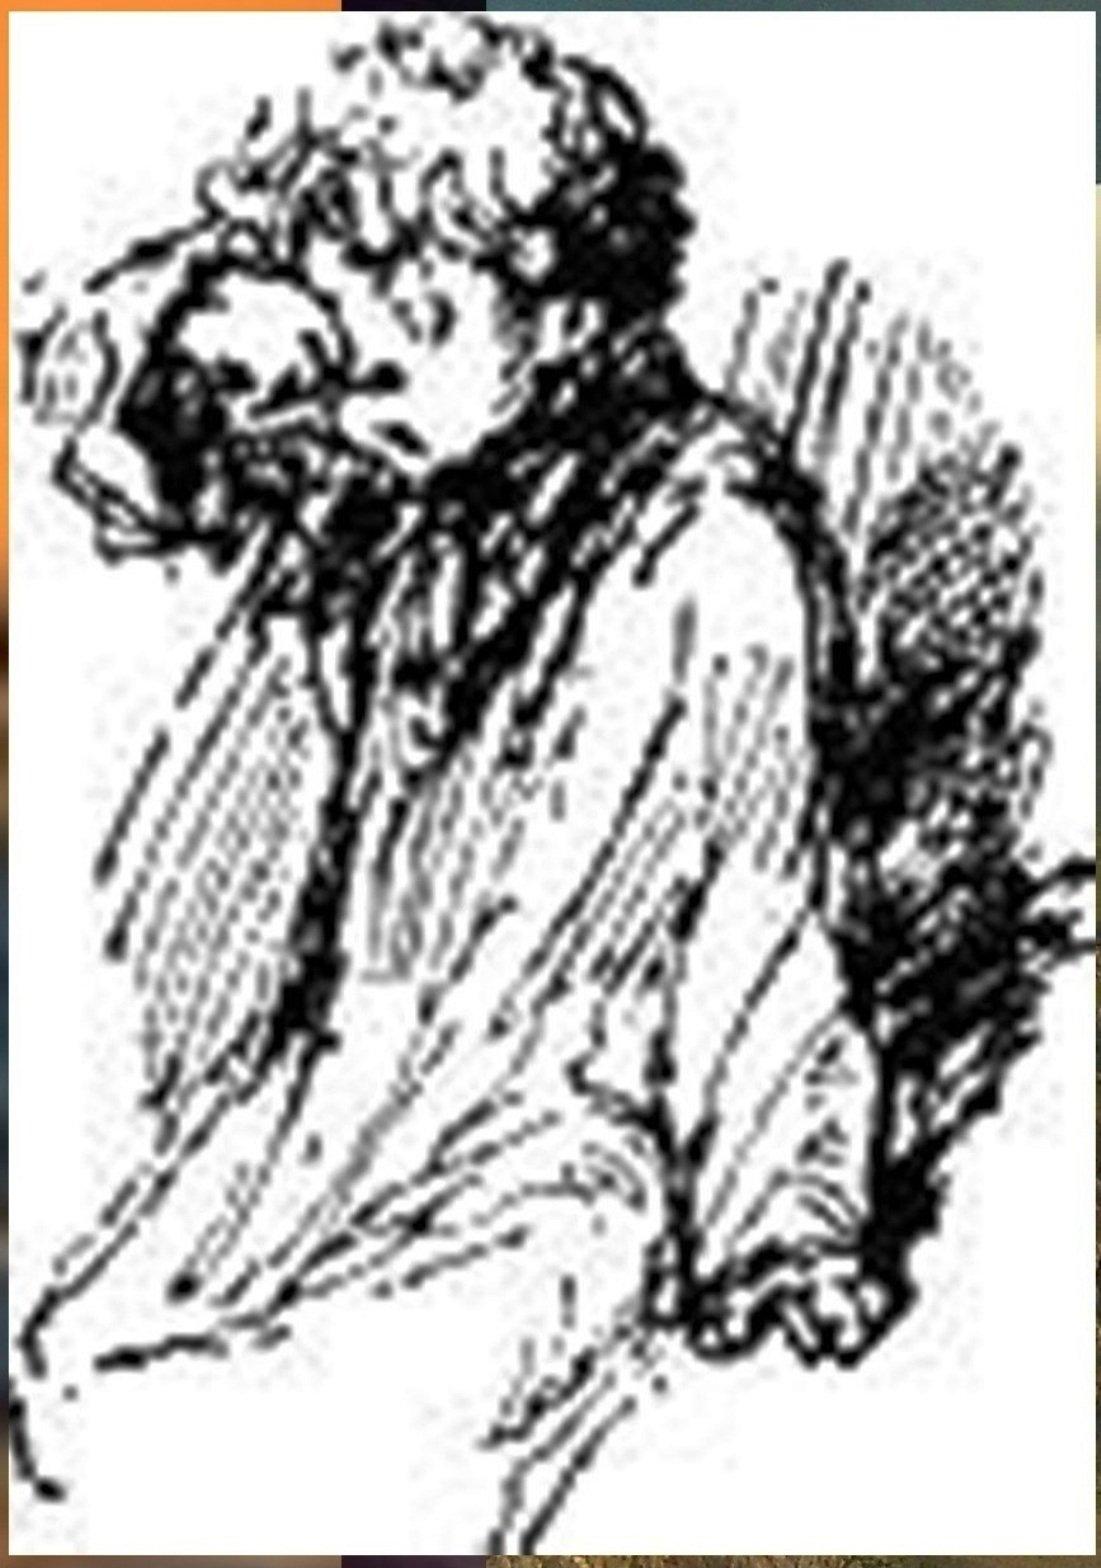 Иллюстрация В. Н. Горяева к пр-ю М.Твена Приключения Тома Сойера (15).